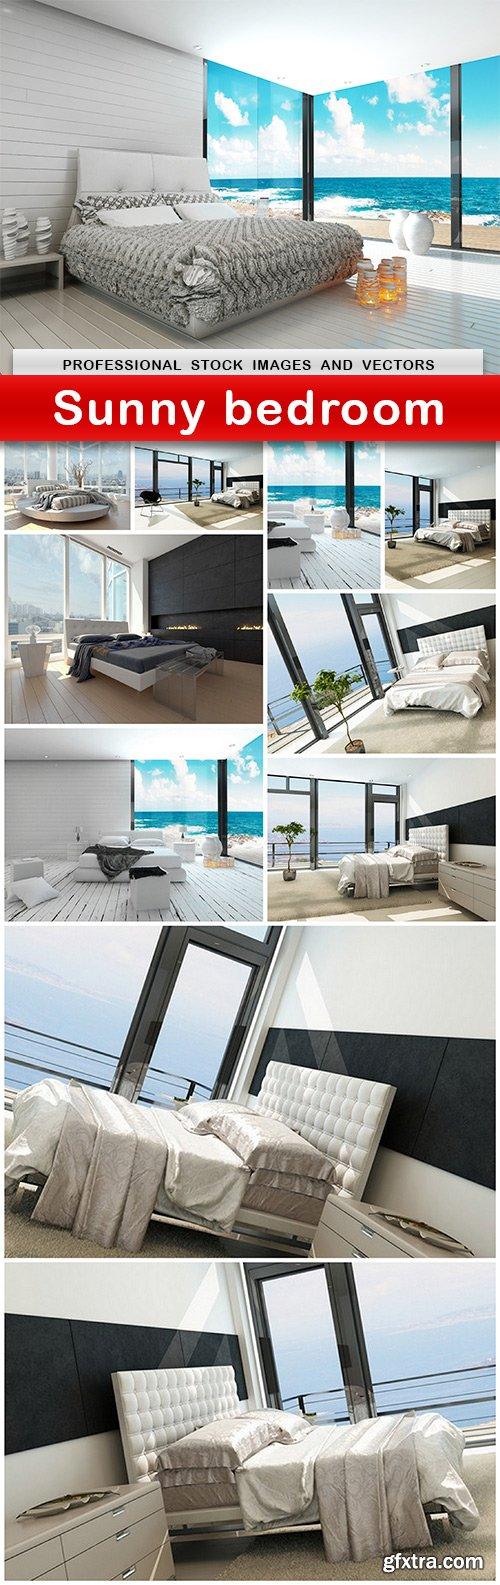 Sunny bedroom - 11 UHQ JPEG